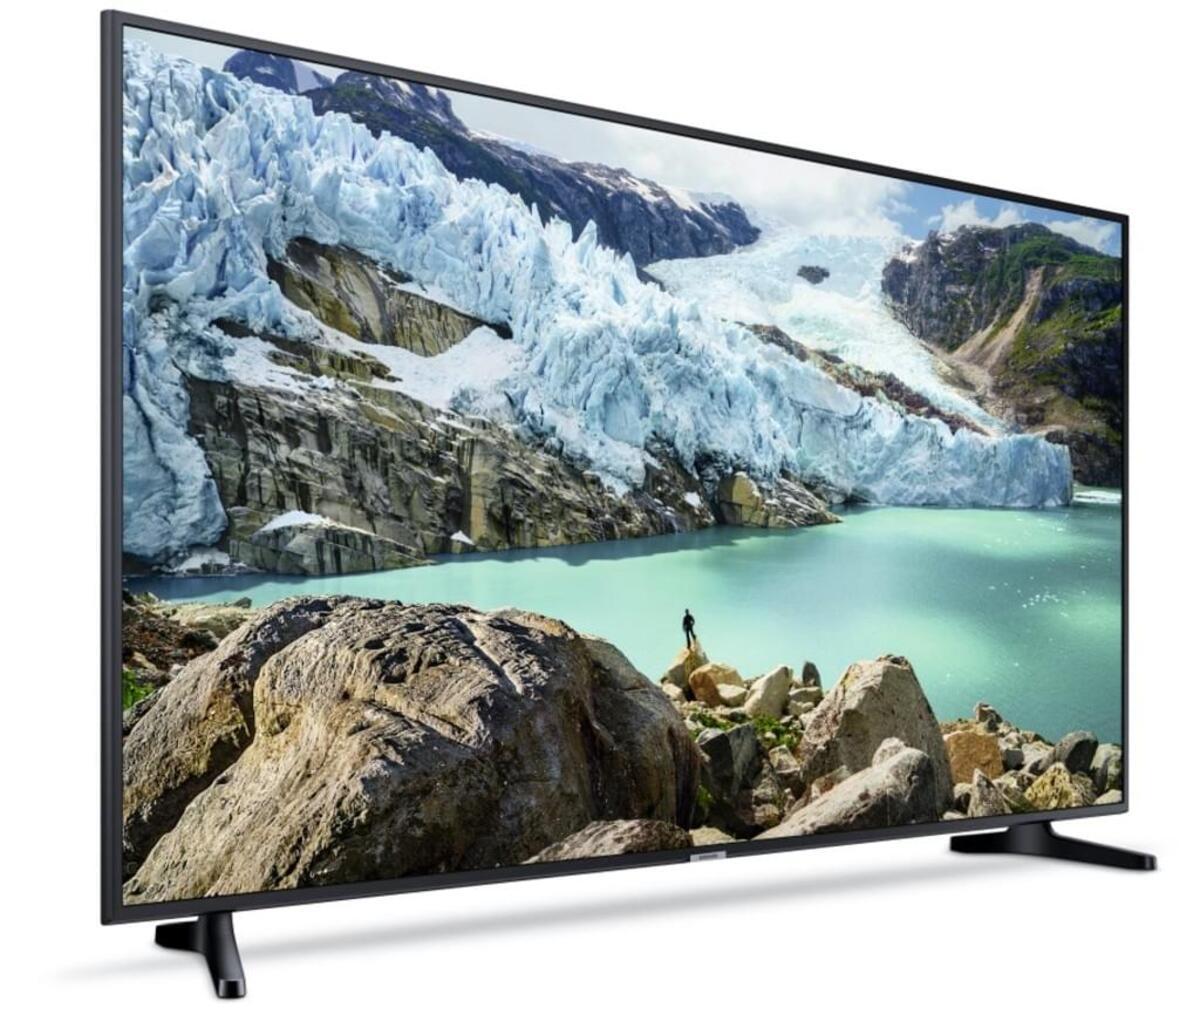 Bild 3 von Samsung 4K Ultra HD LED 108 cm (43 Zoll) 43RU7099 Smart TV, Triple Tuner, HDR10+